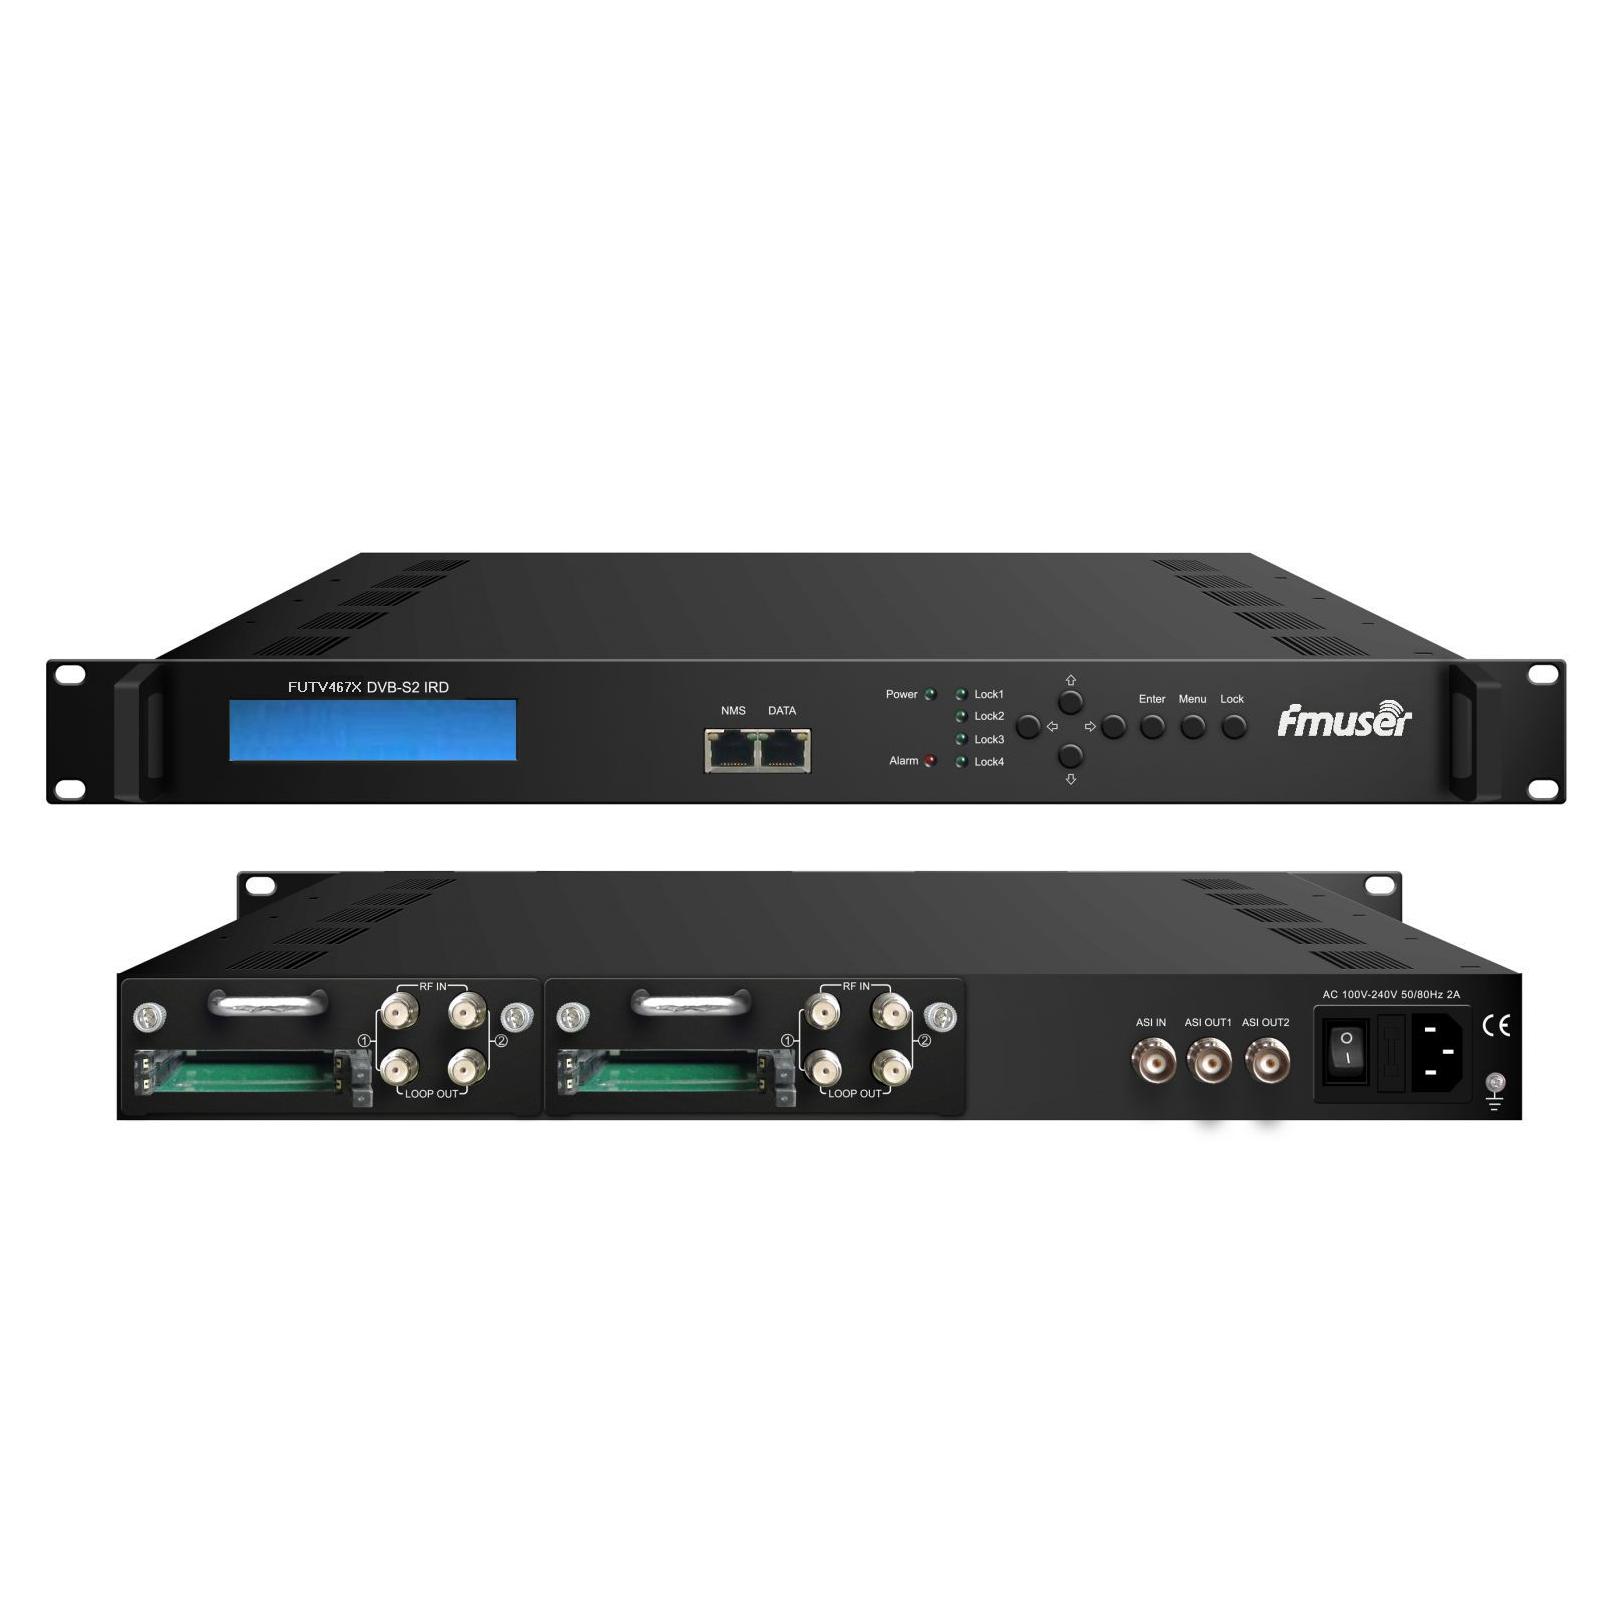 Sintonizador FMUSER FUTV467X 4 CAM IRD (entrada RF 4 DVB-C / T / S / S2, entrada IP ASI 1, saída IP ASI 2 1) com MUX